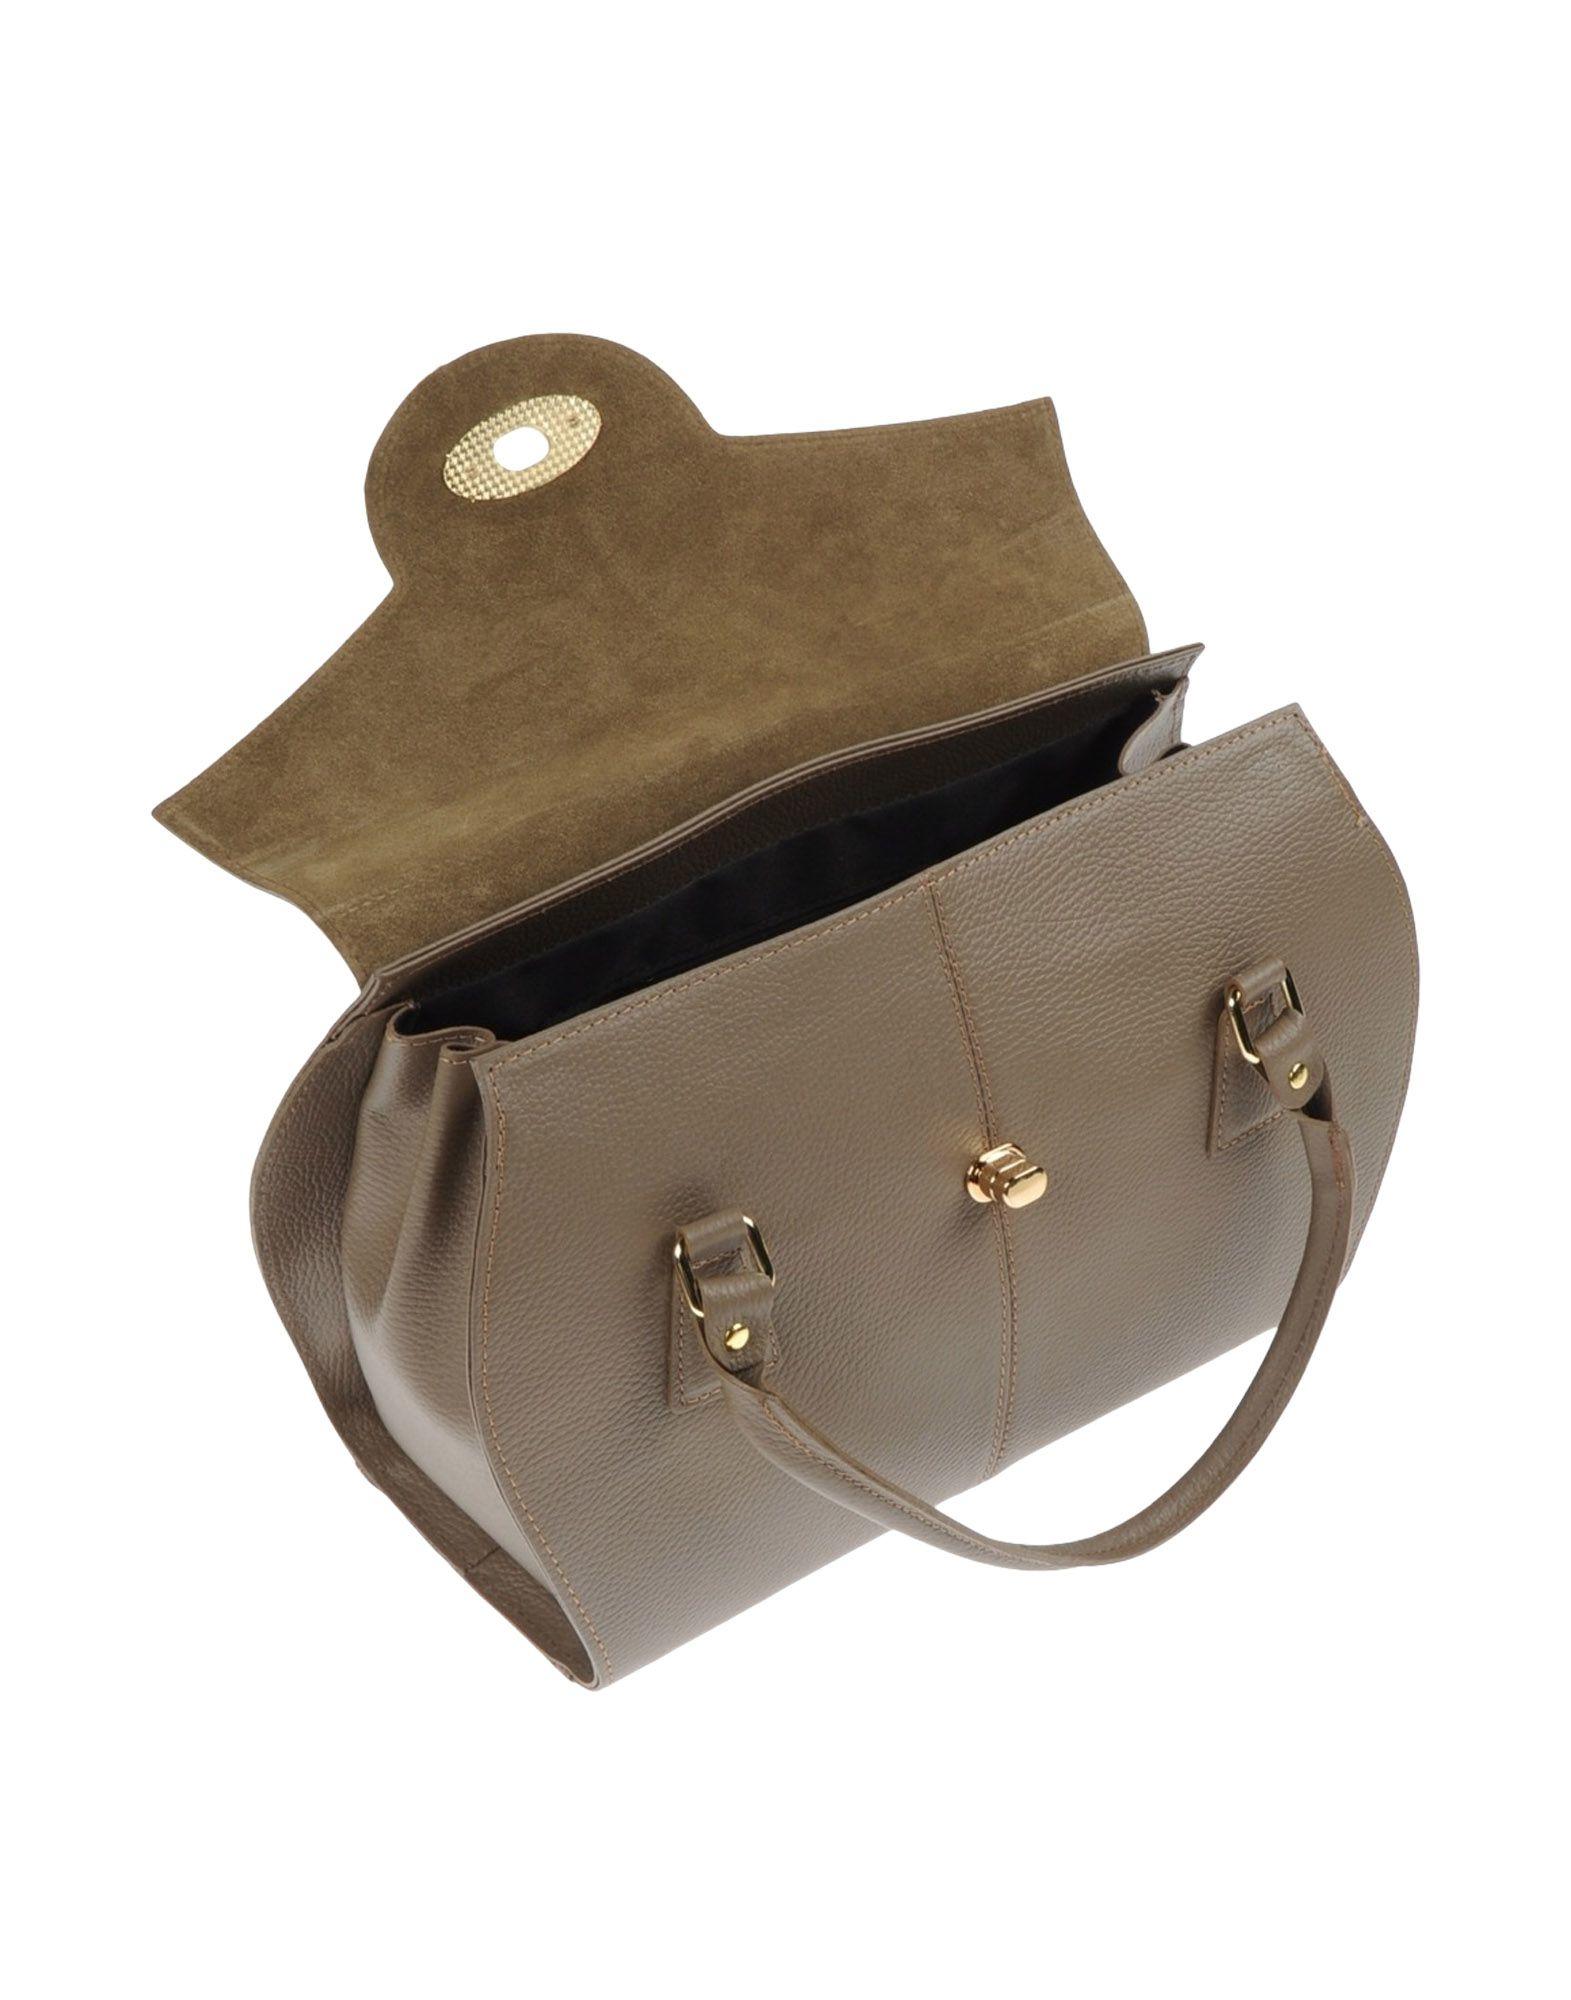 jean louis scherrer handbag in gray lyst. Black Bedroom Furniture Sets. Home Design Ideas